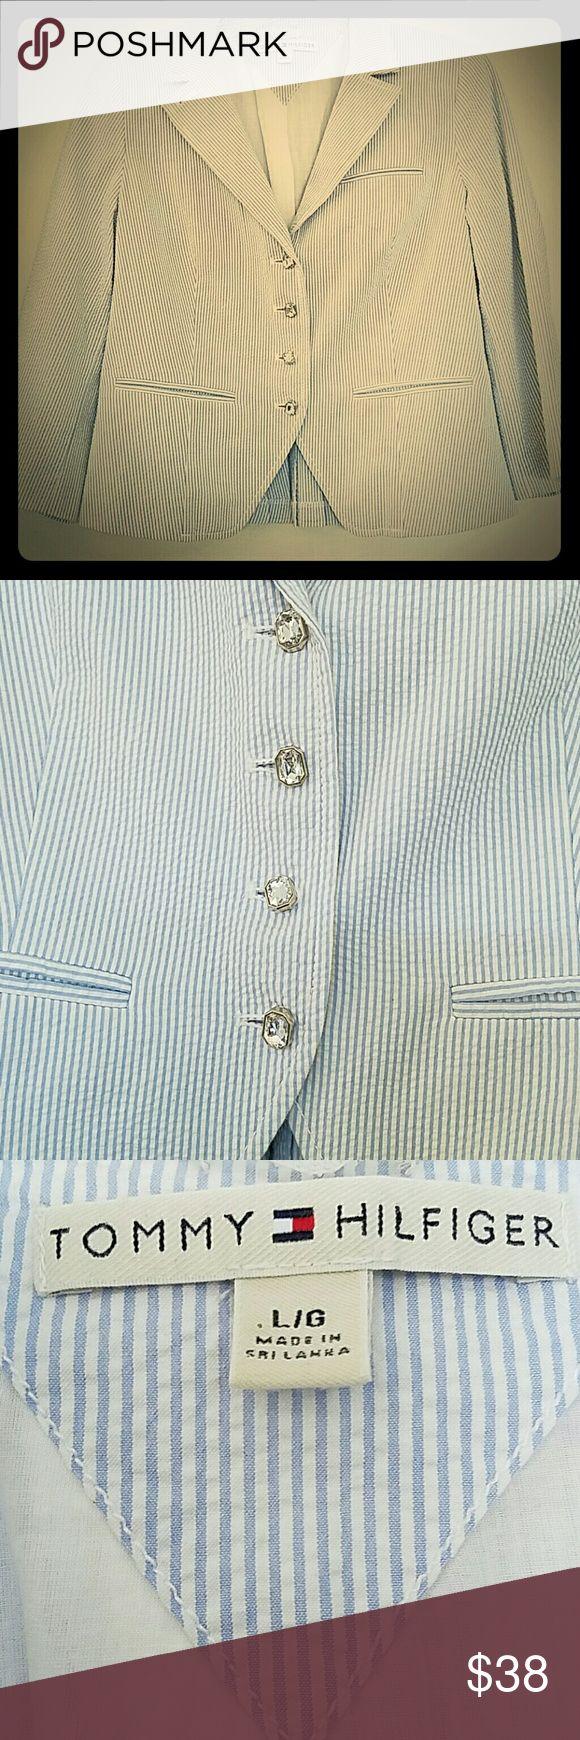 Tommy Hilfiger seersucker blazer w/rhinestone Tommy Hilfiger seersucker blazer with rhinestone buttons and pleated back. Tommy Hilfiger Jackets & Coats Blazers